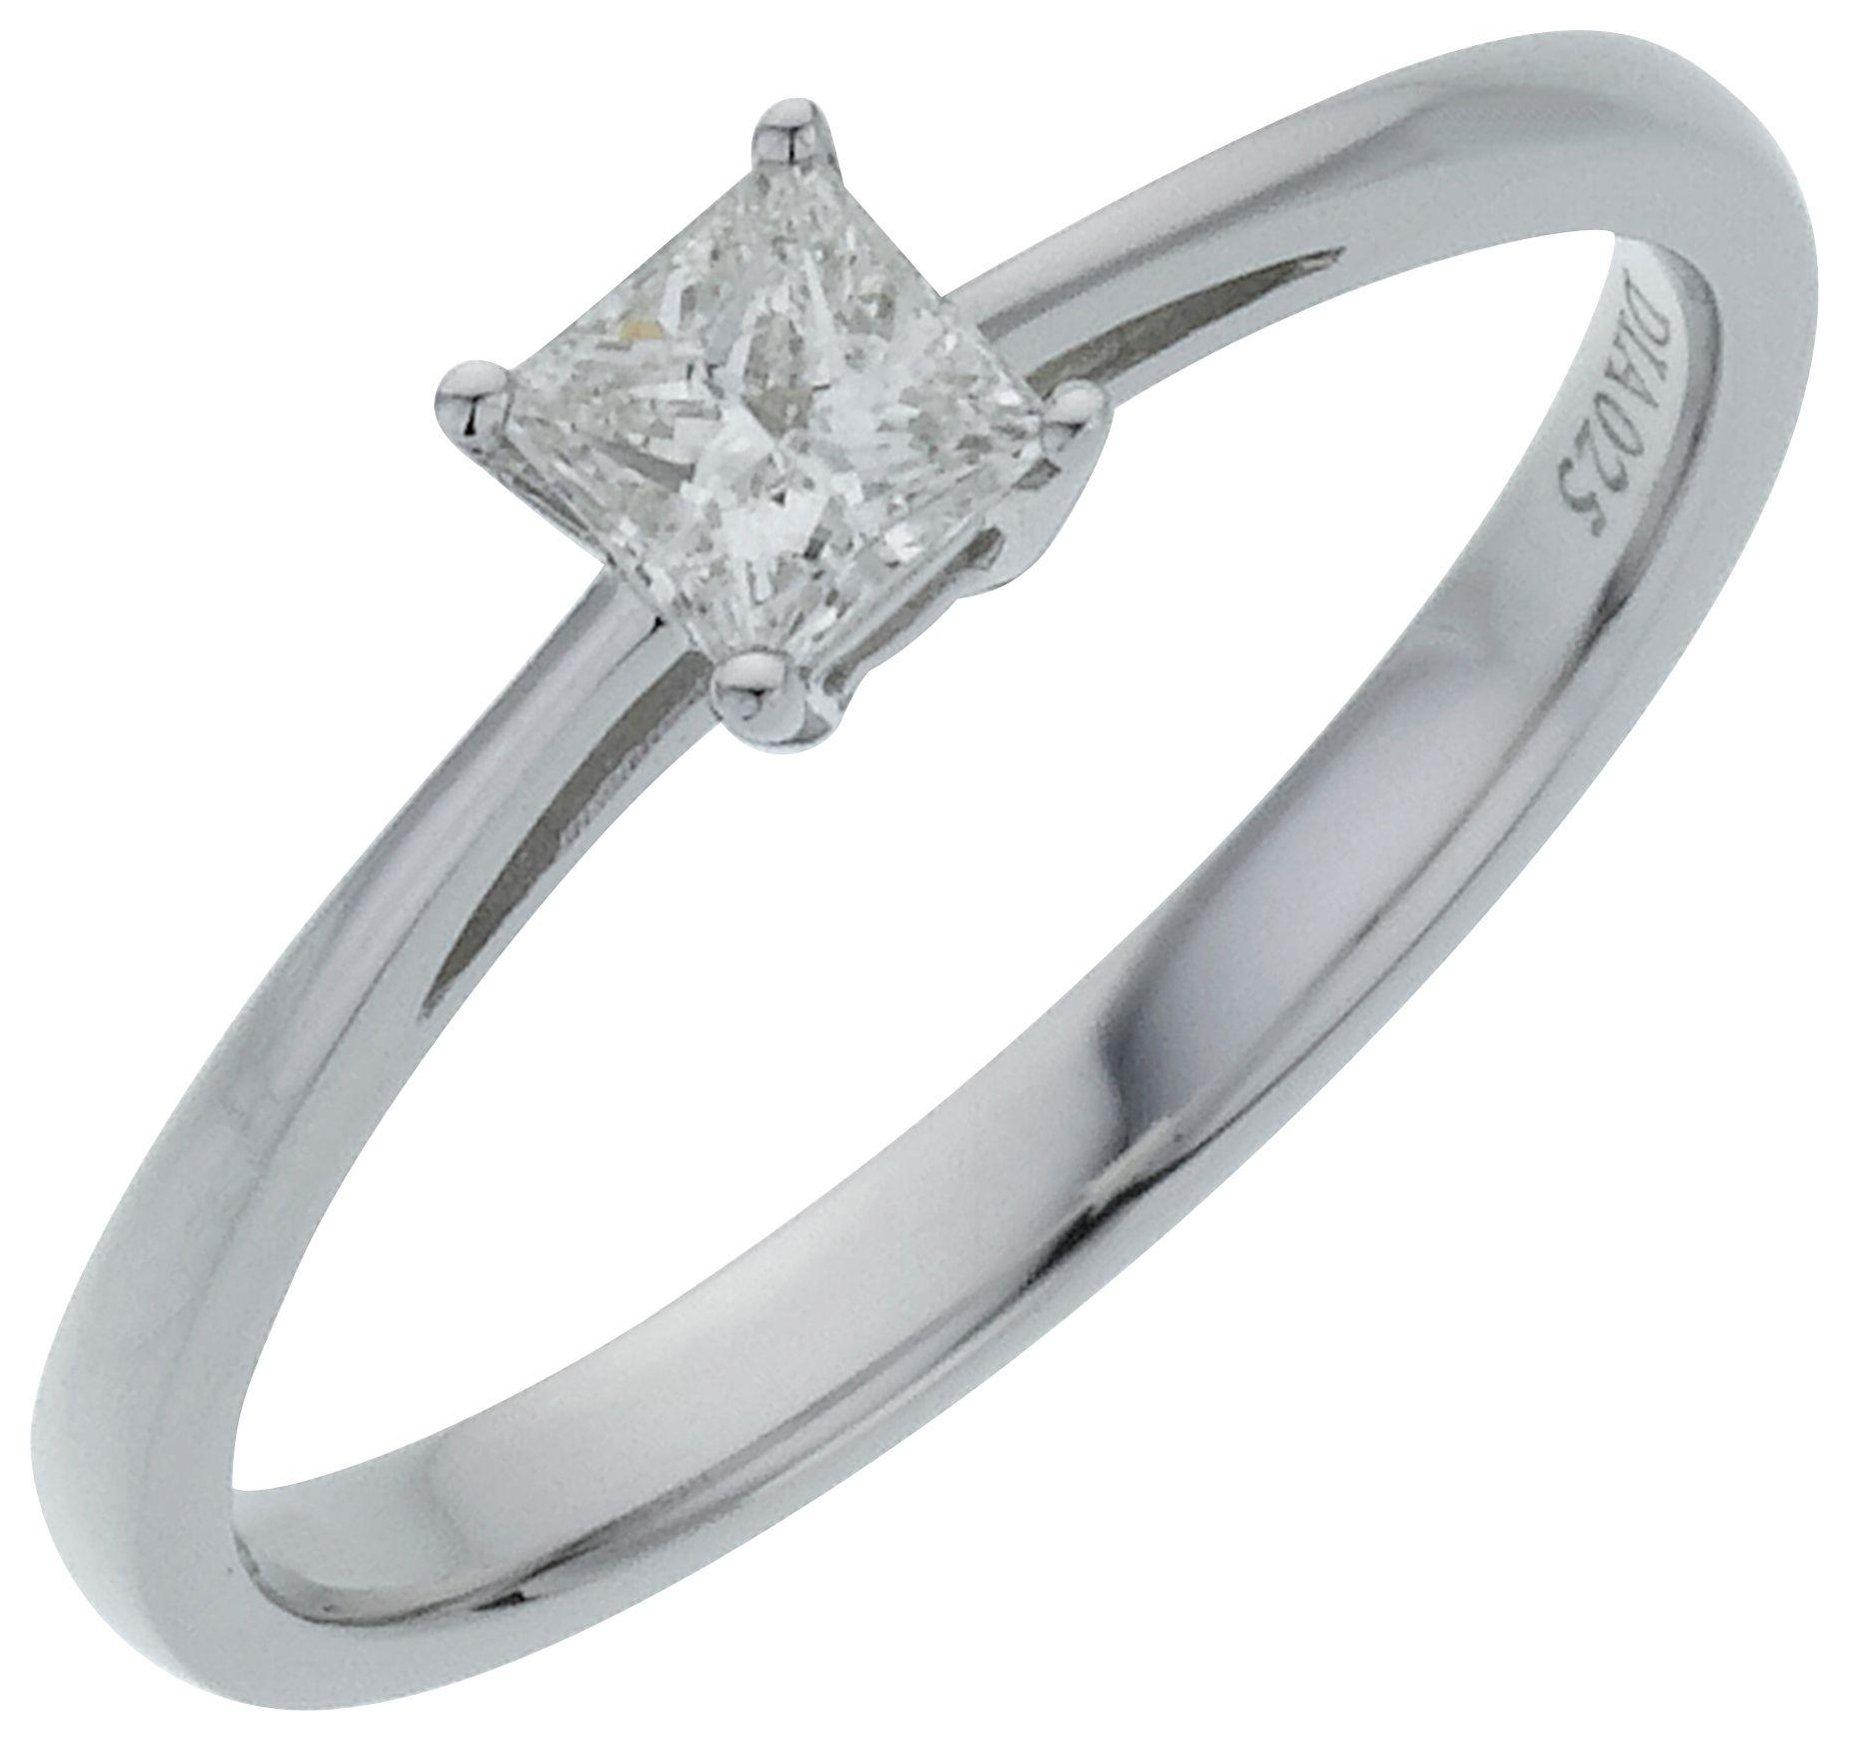 18 Carat White Gold 025 Carat Diamond - Princess Cut Diamond - Ring - T